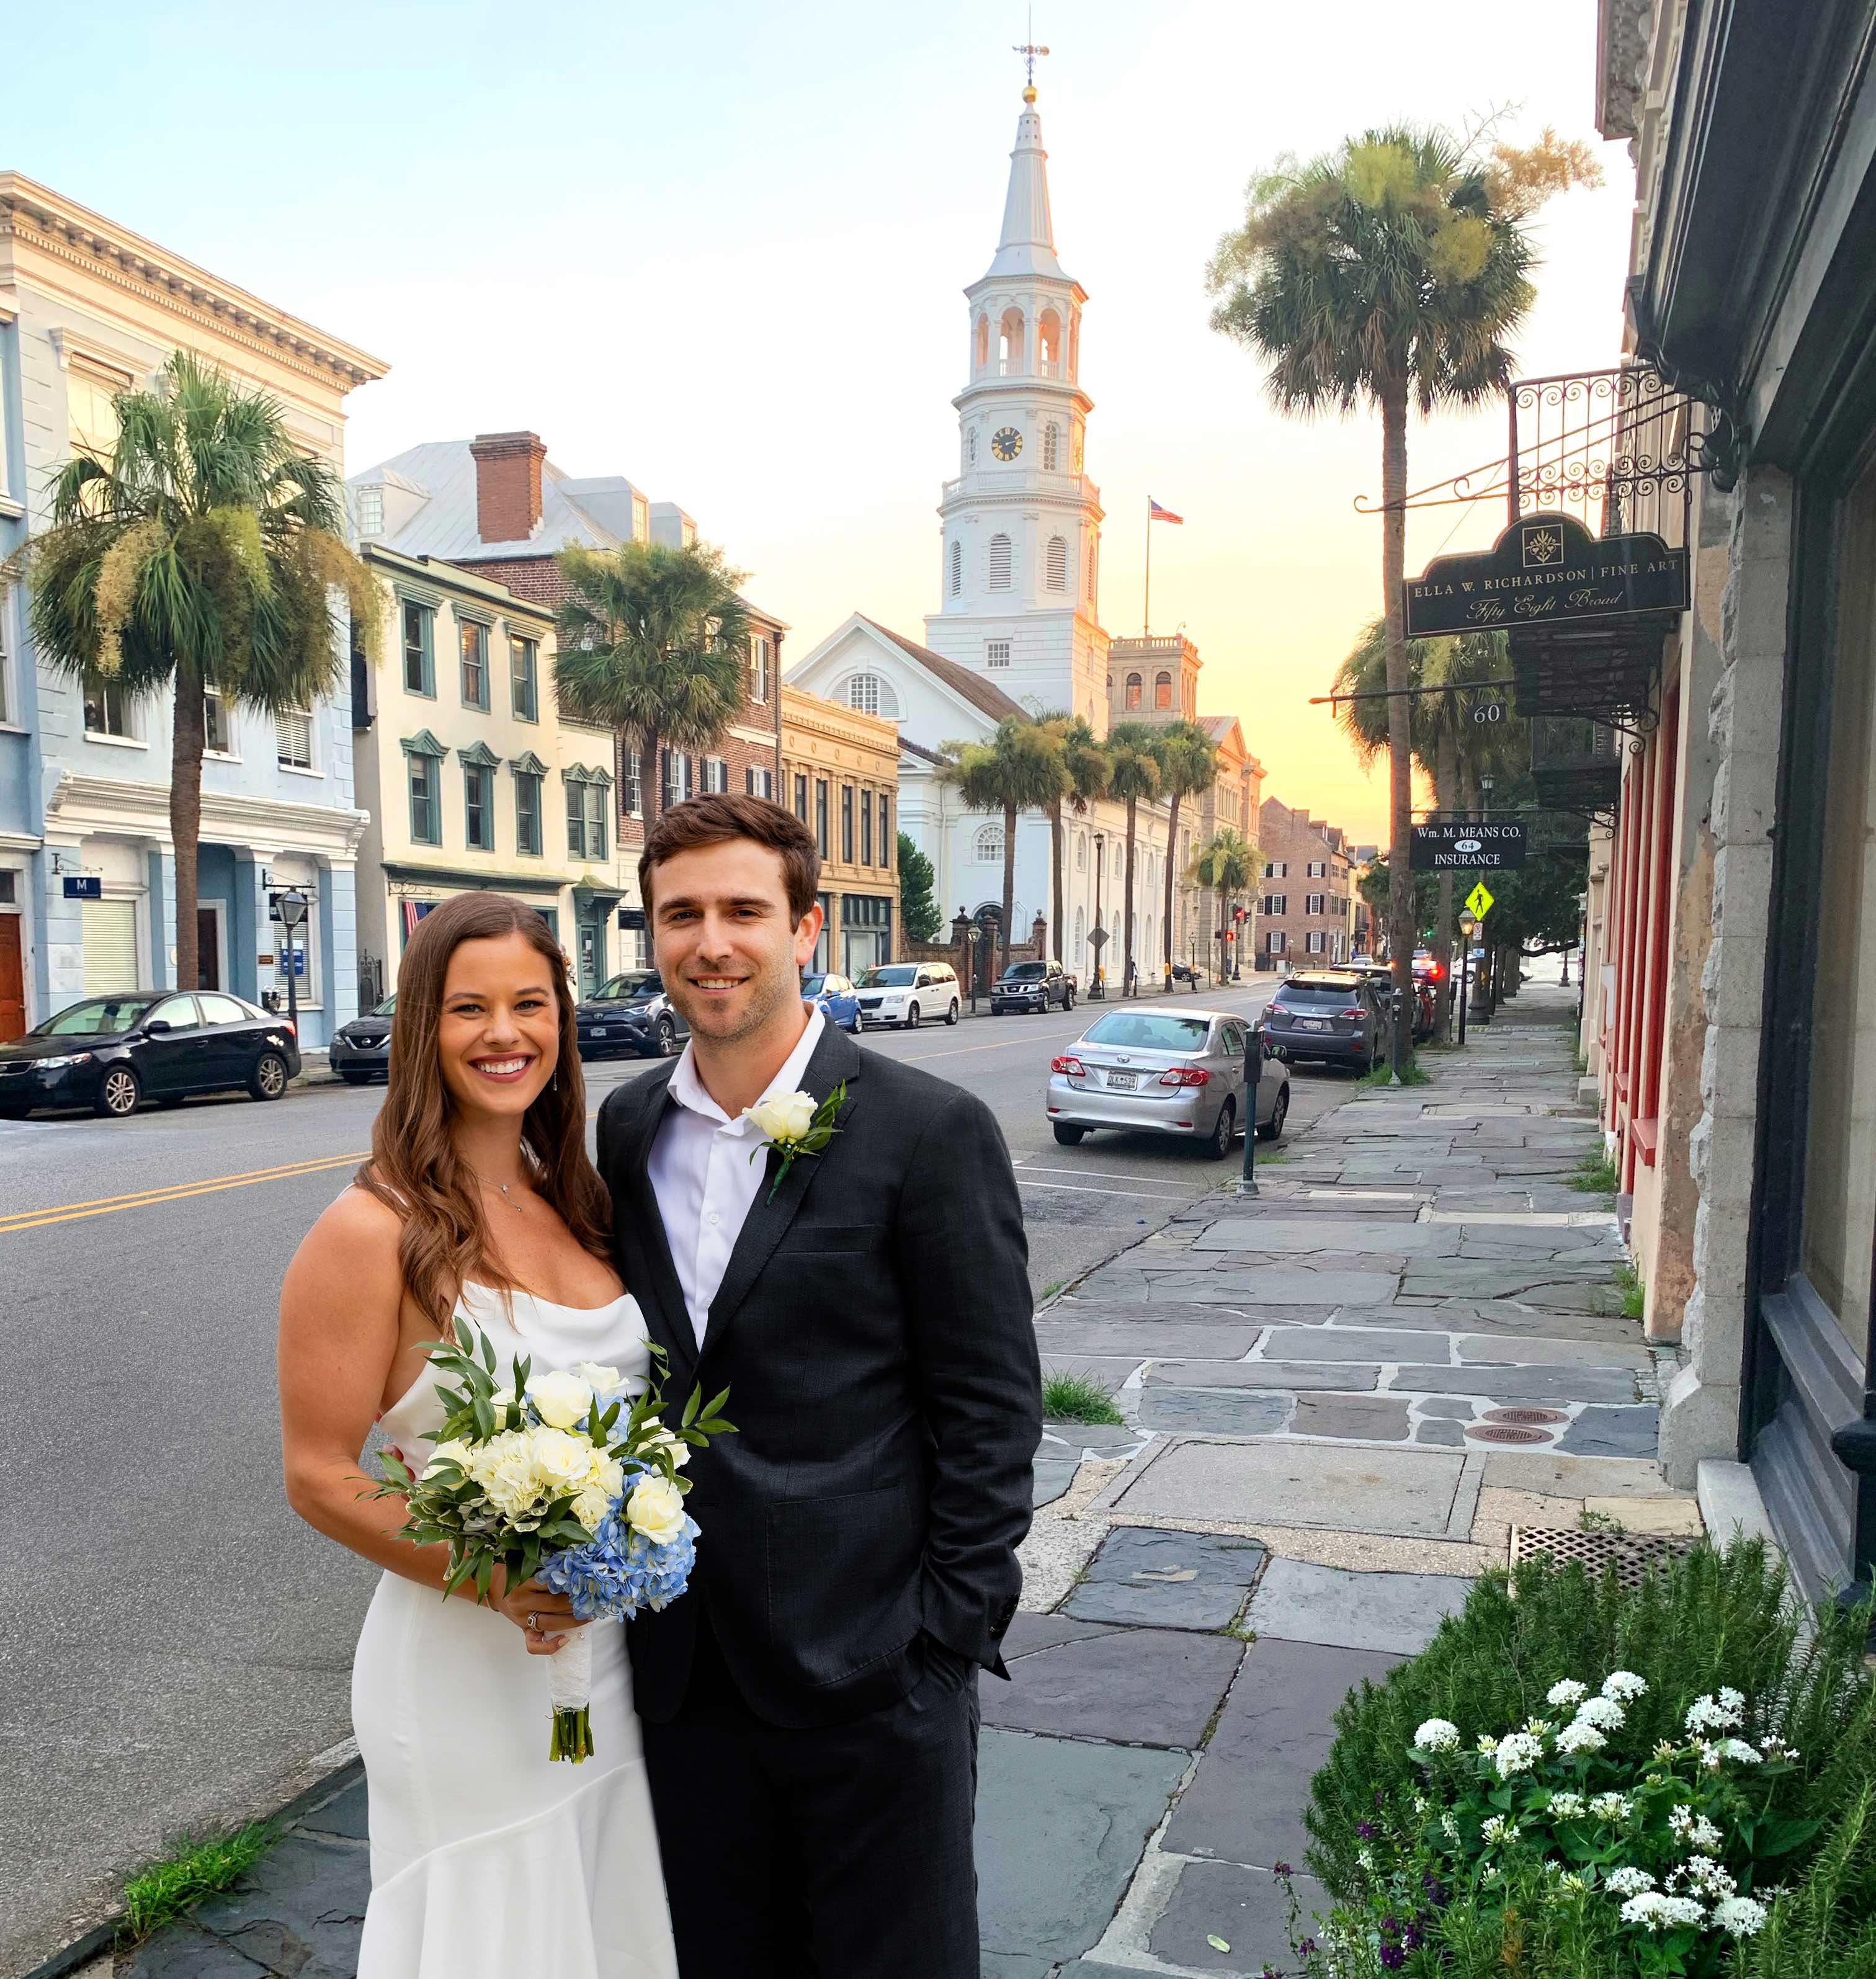 wedding-bar-rental-company-charleston-south-carolina